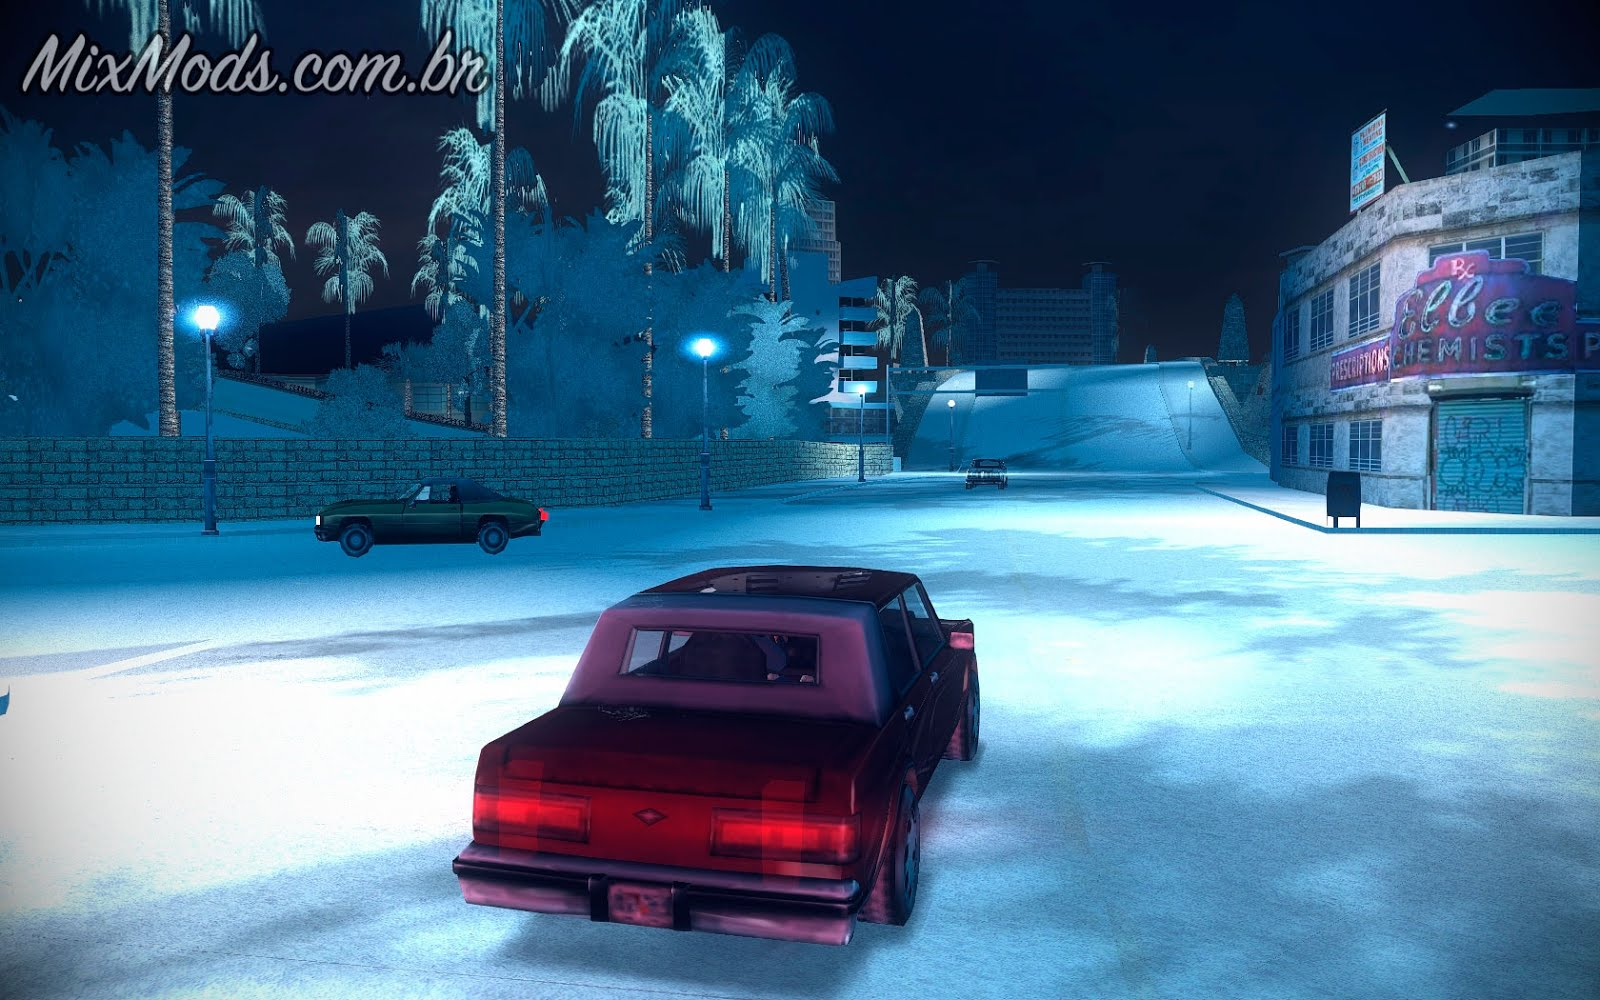 VC] Winter Mod 3 0 (PC / Android) -   MixMods   Mods para GTA SA e